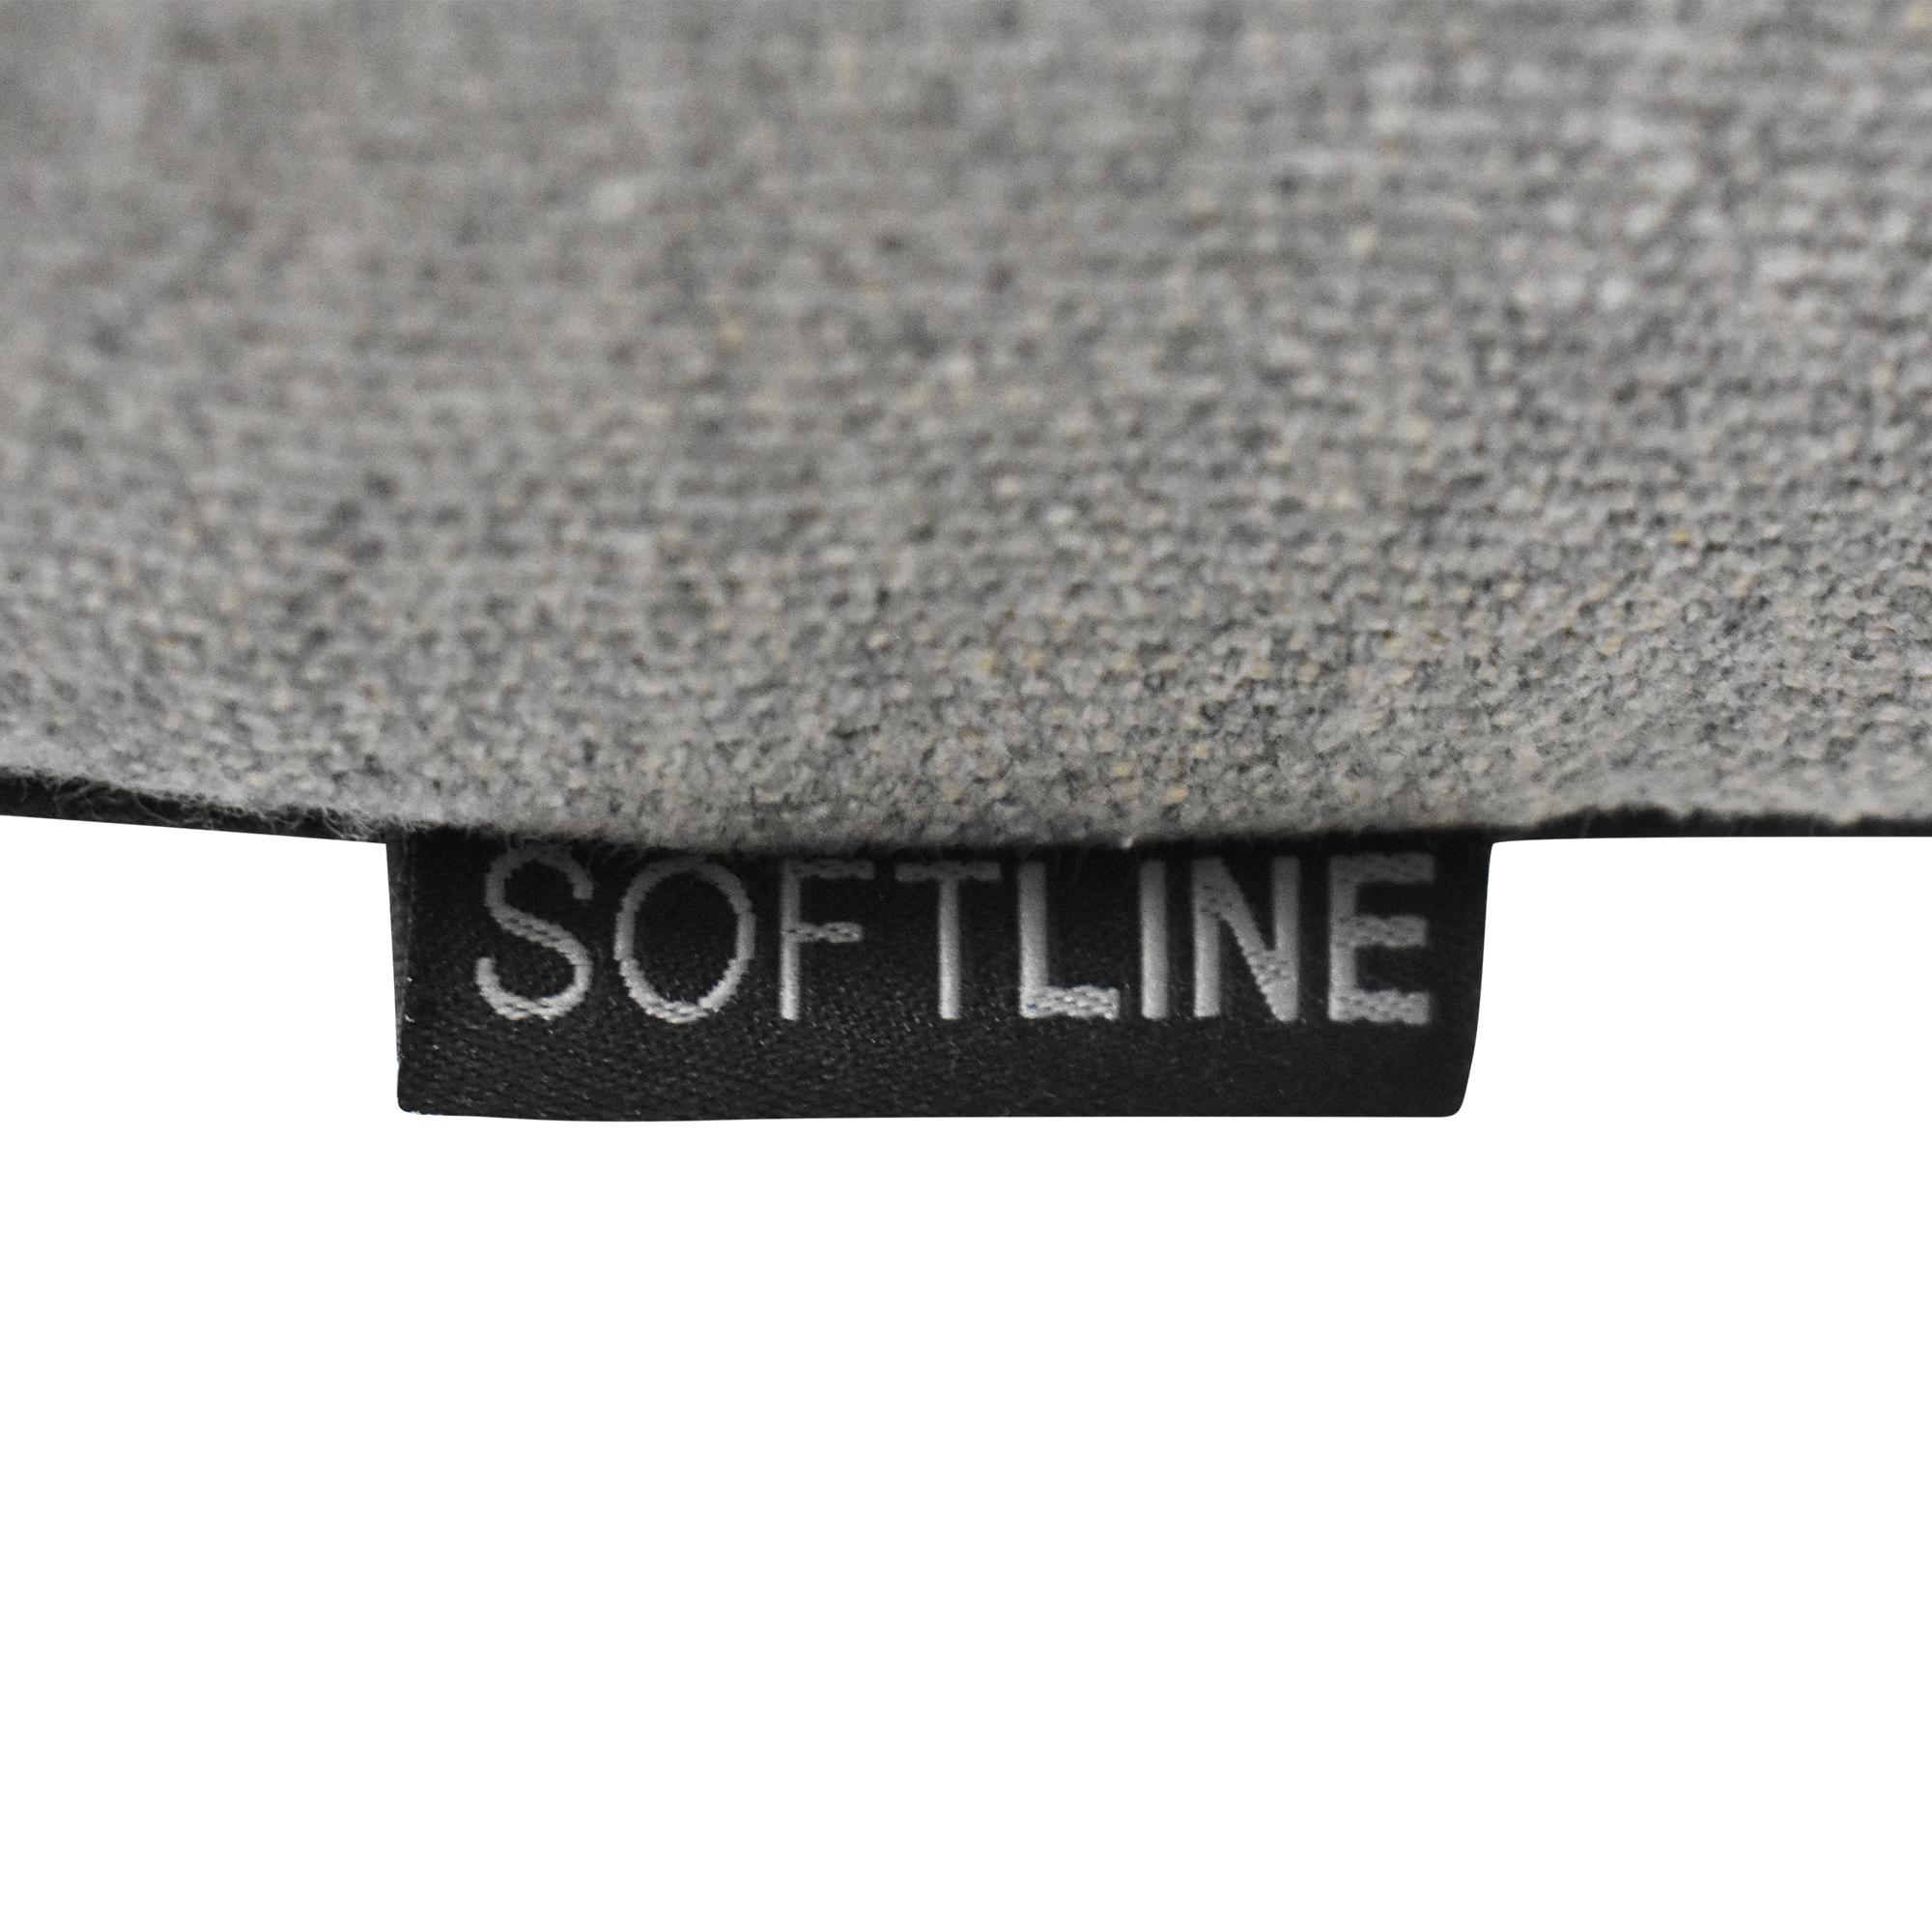 Softline Softline City 2.5 Seater Sofa Bed